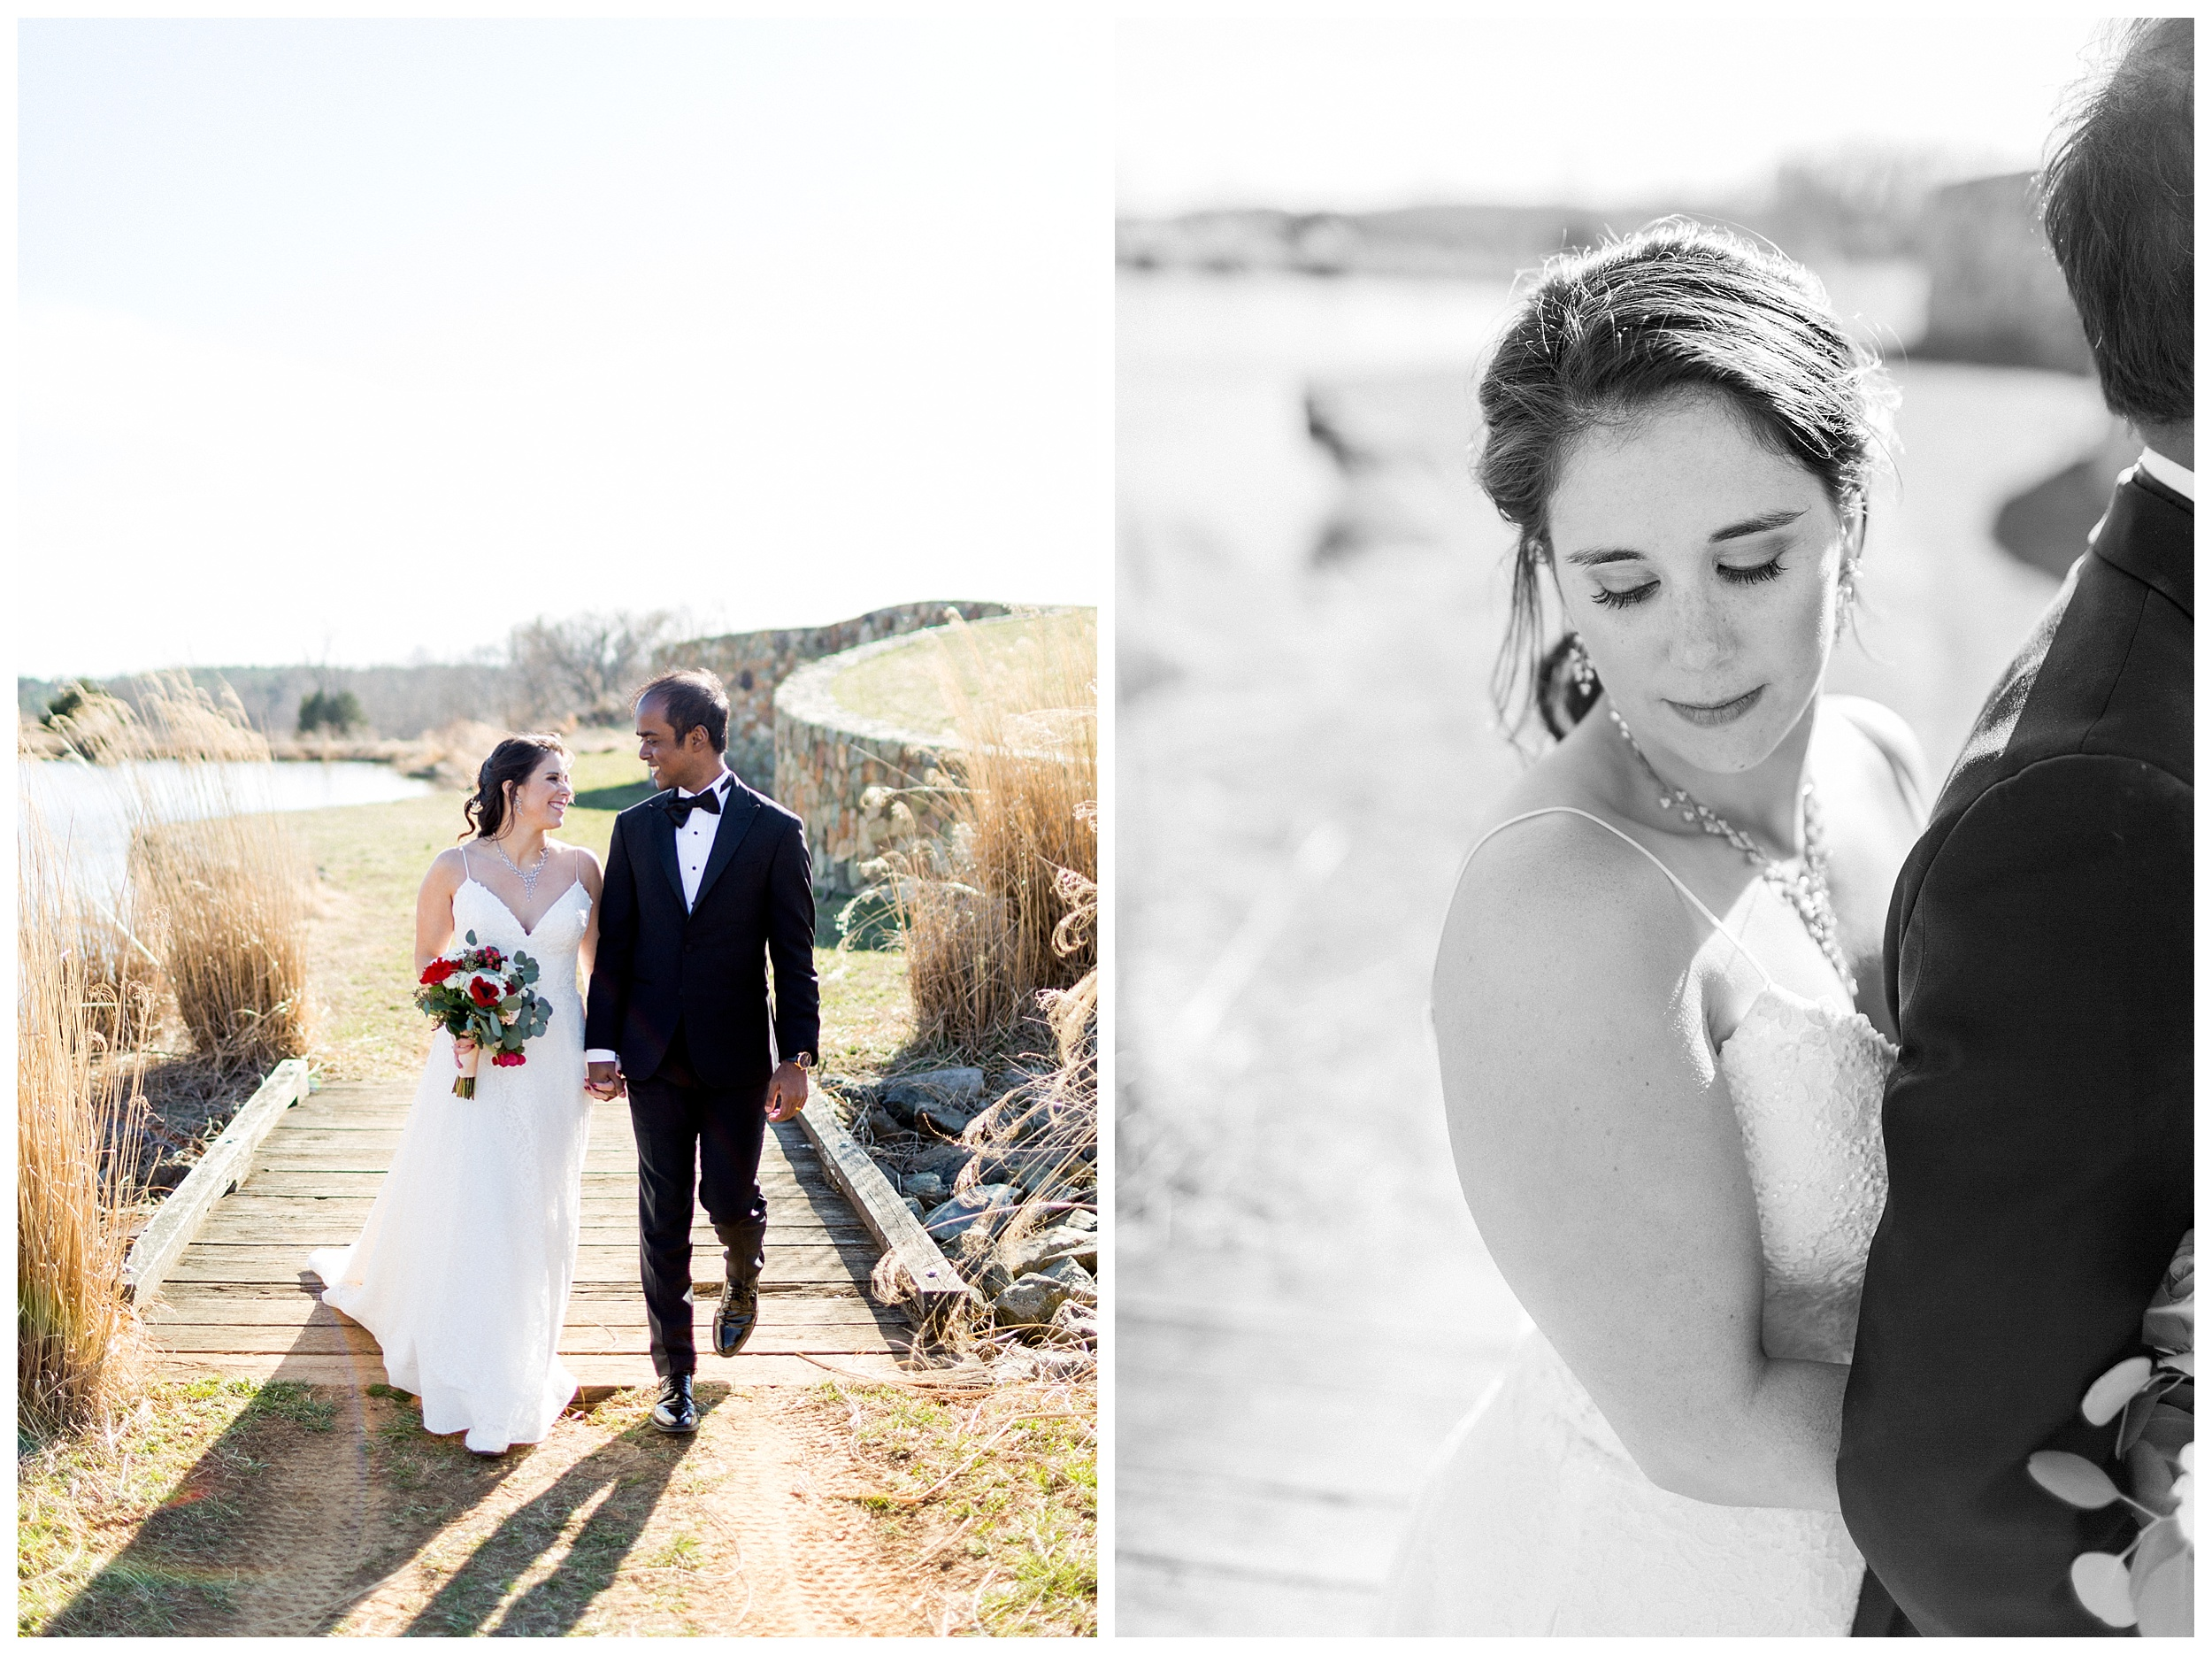 Stone Tower Winery Wedding | Virginia Winter Wedding | VA Wedding Photographer Kir Tuben_0048.jpg